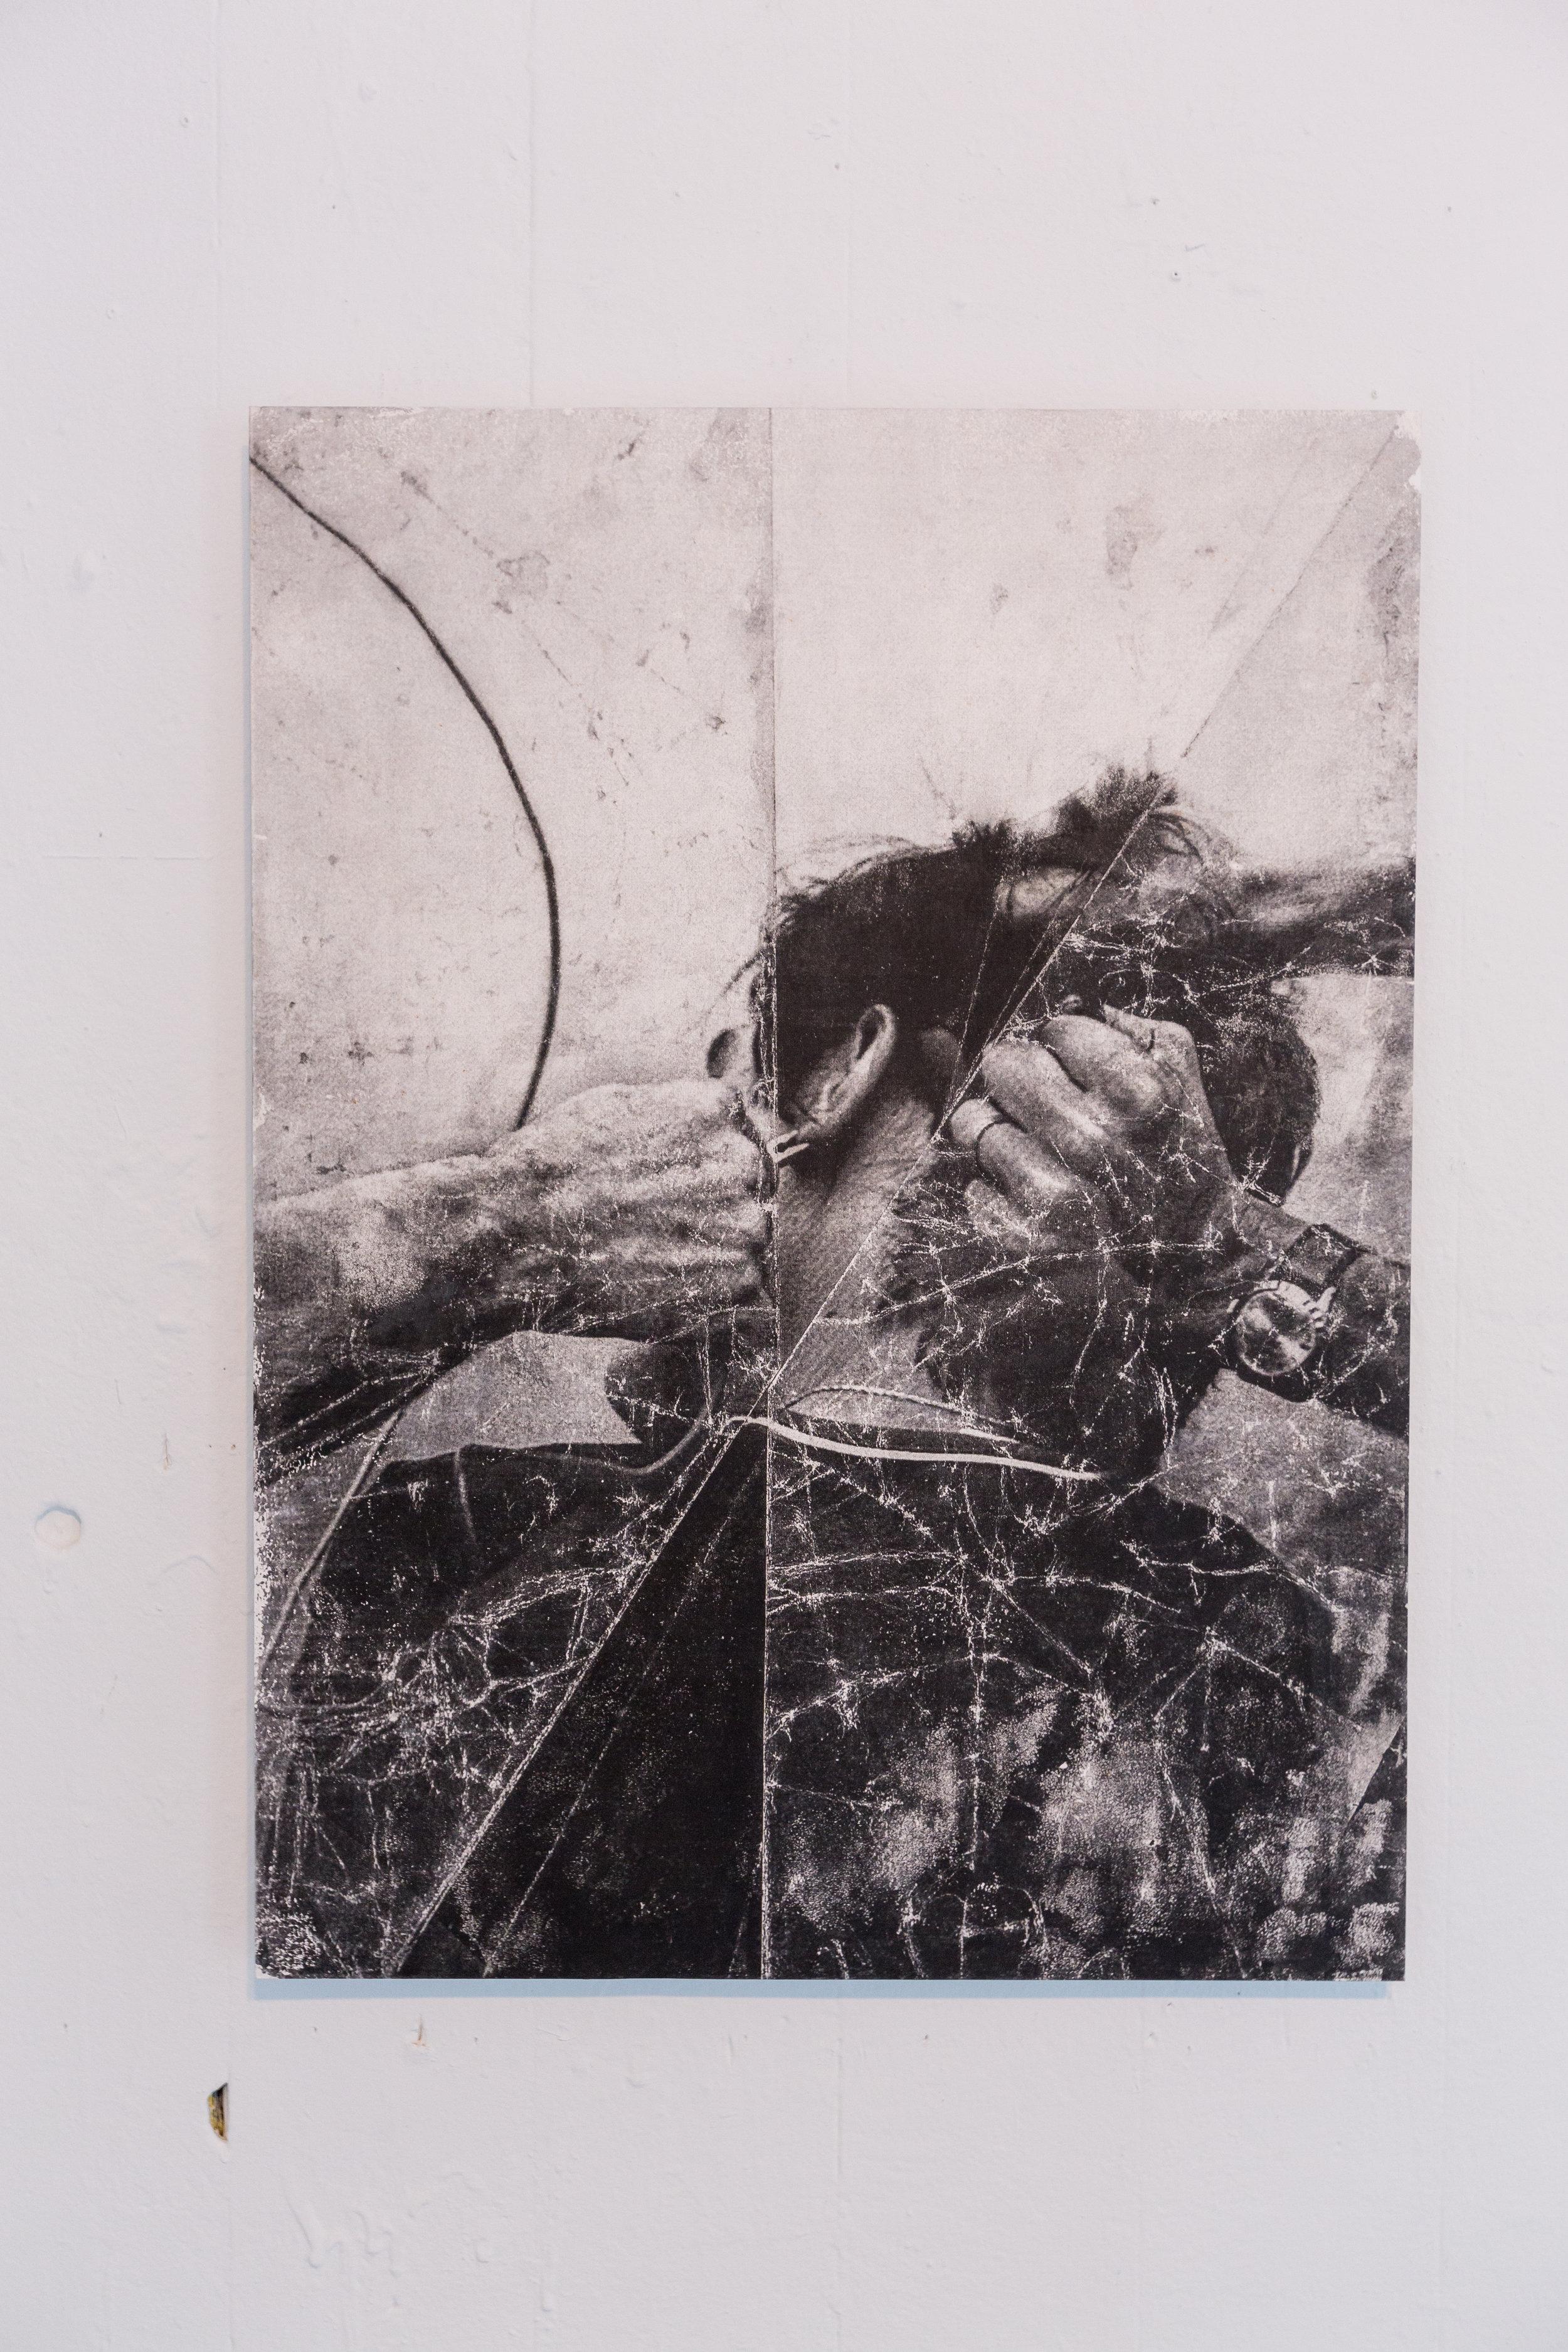 Dayward , Harold Mendez